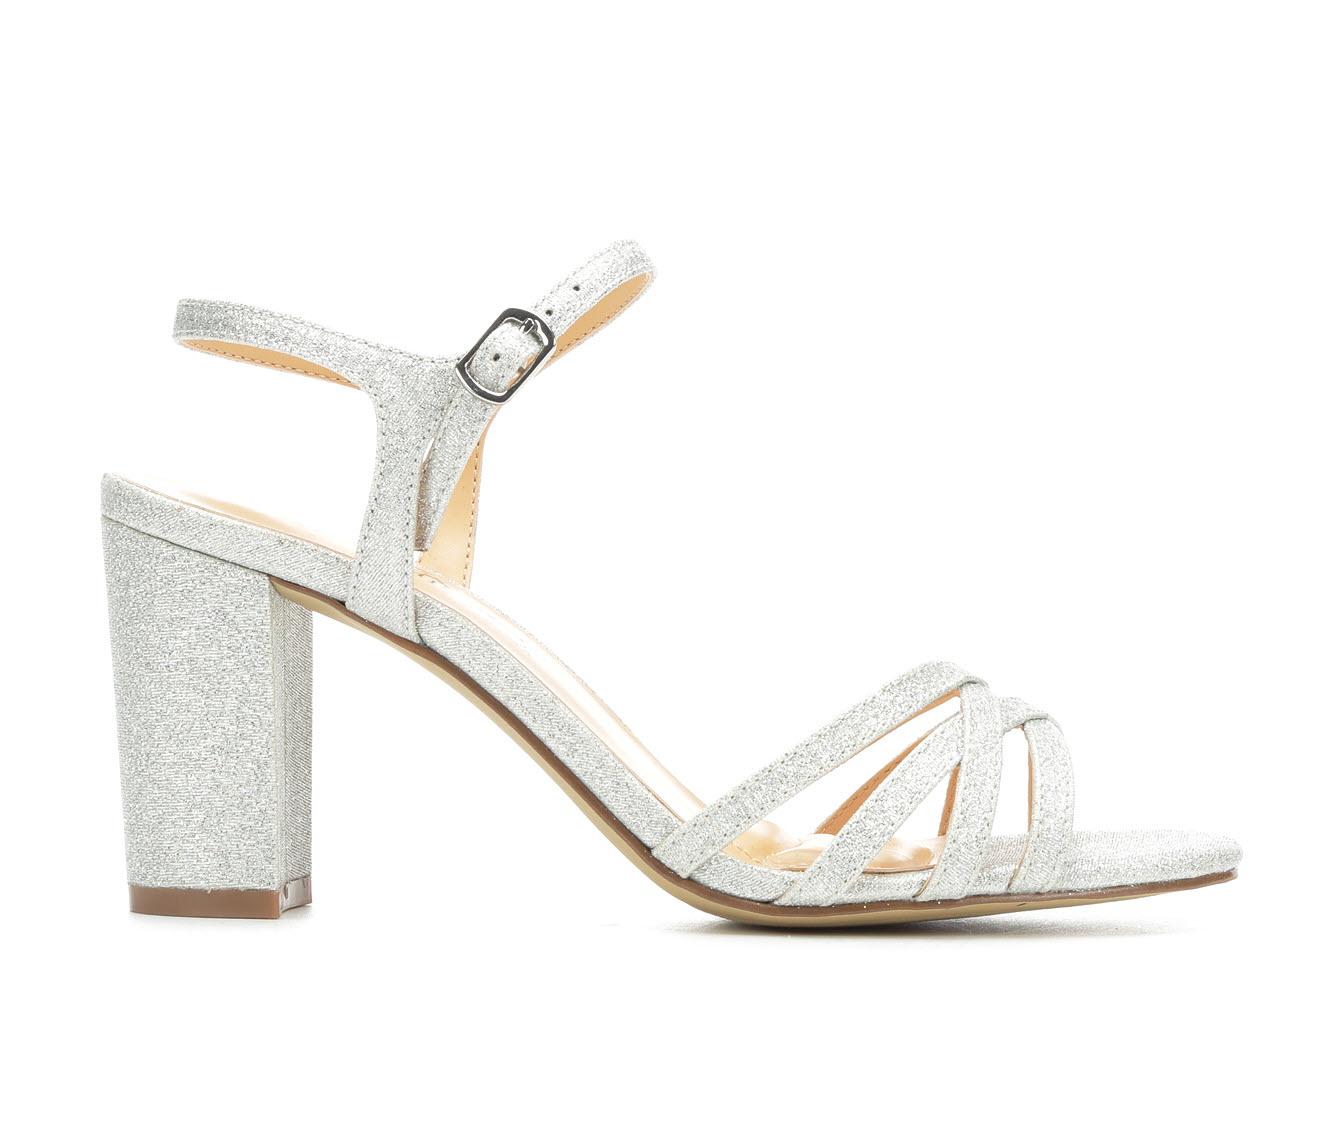 American Glamour BadgleyM Xandra Women's Dress Shoe (Silver Canvas)